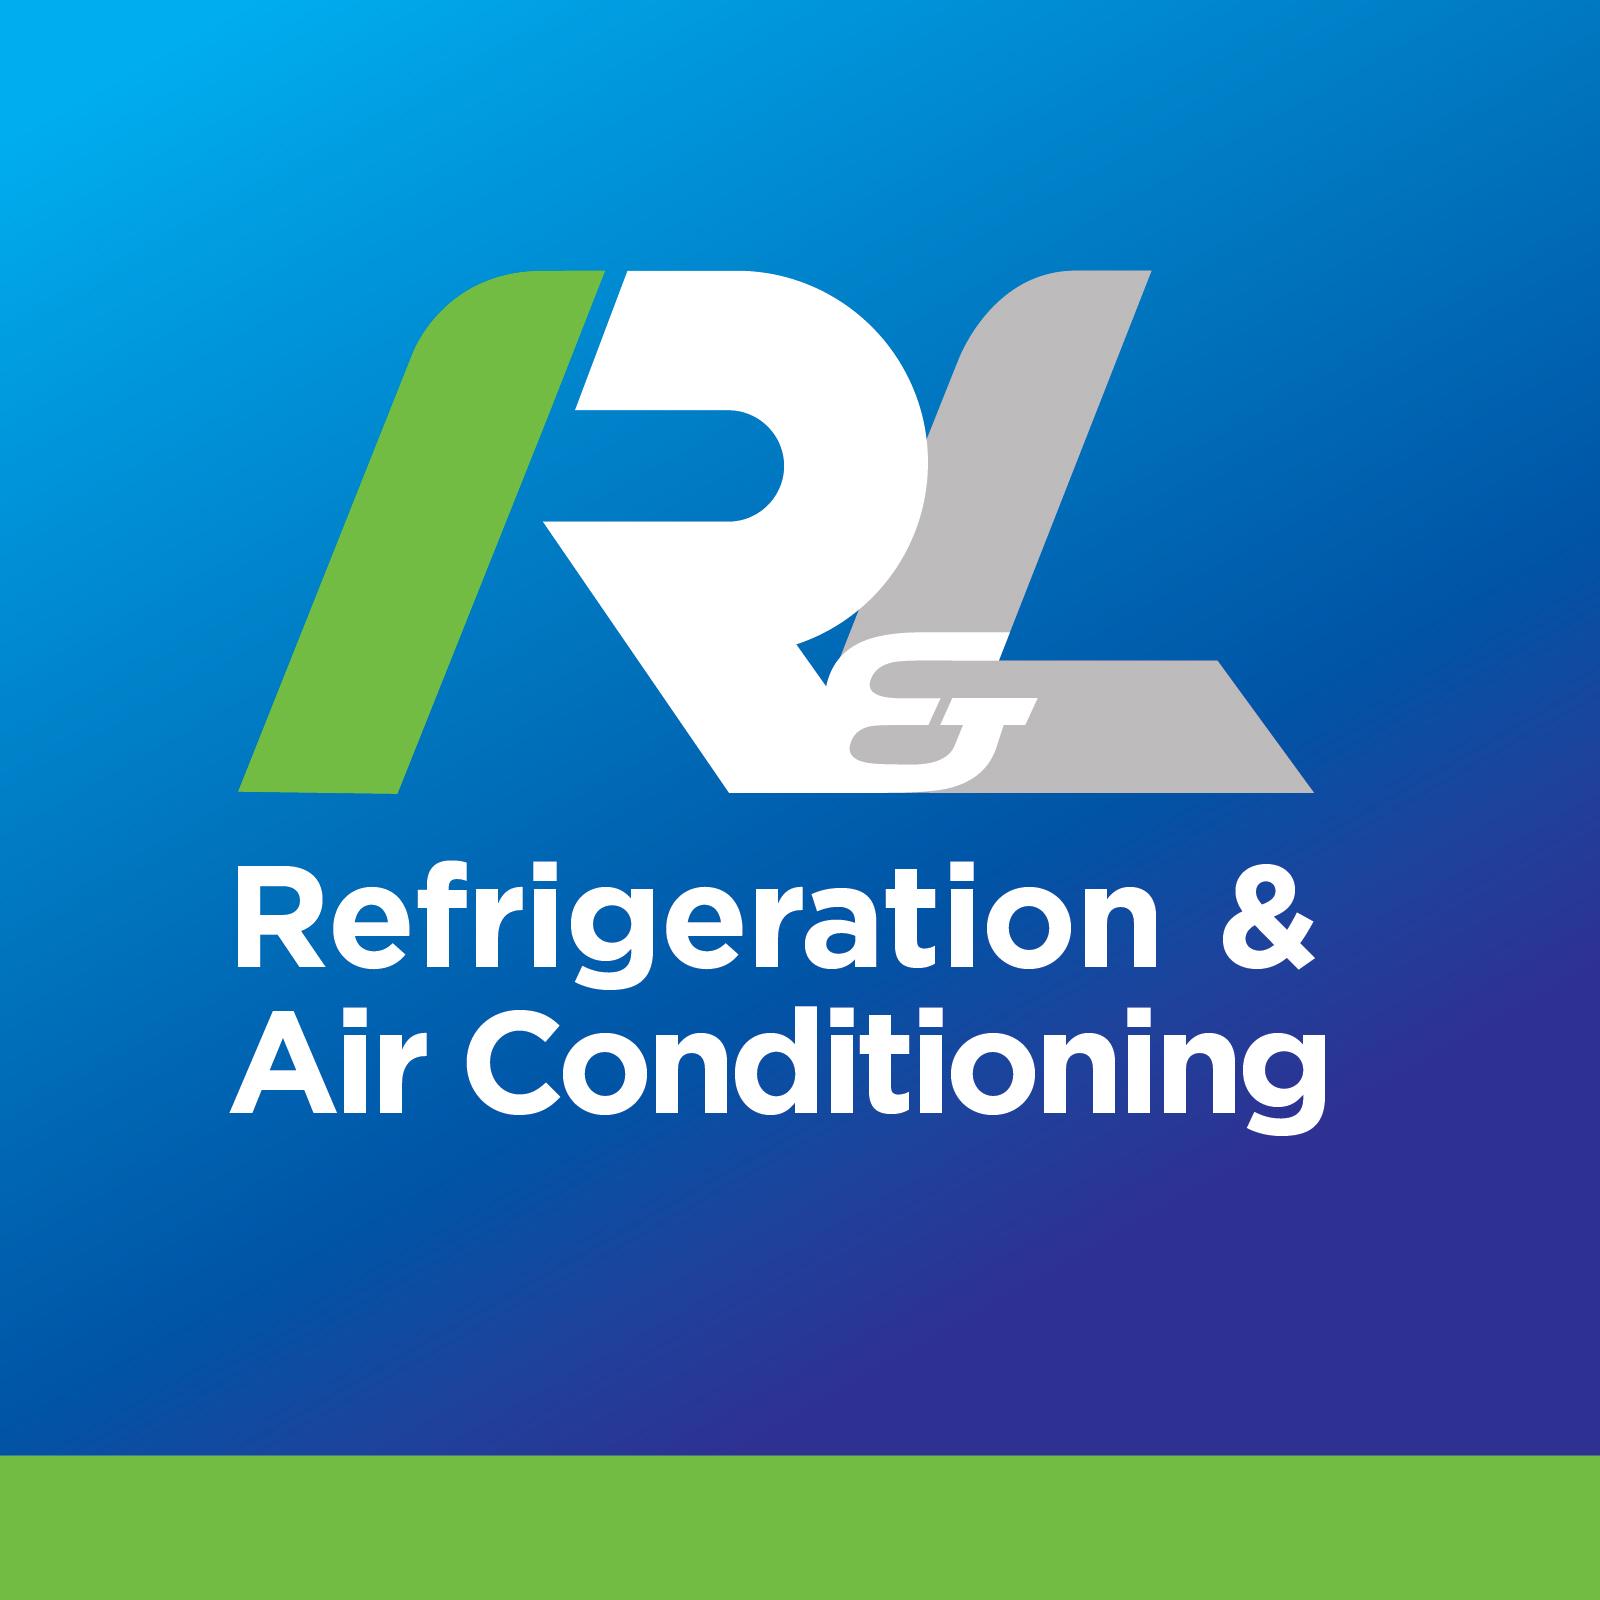 R and L logo design